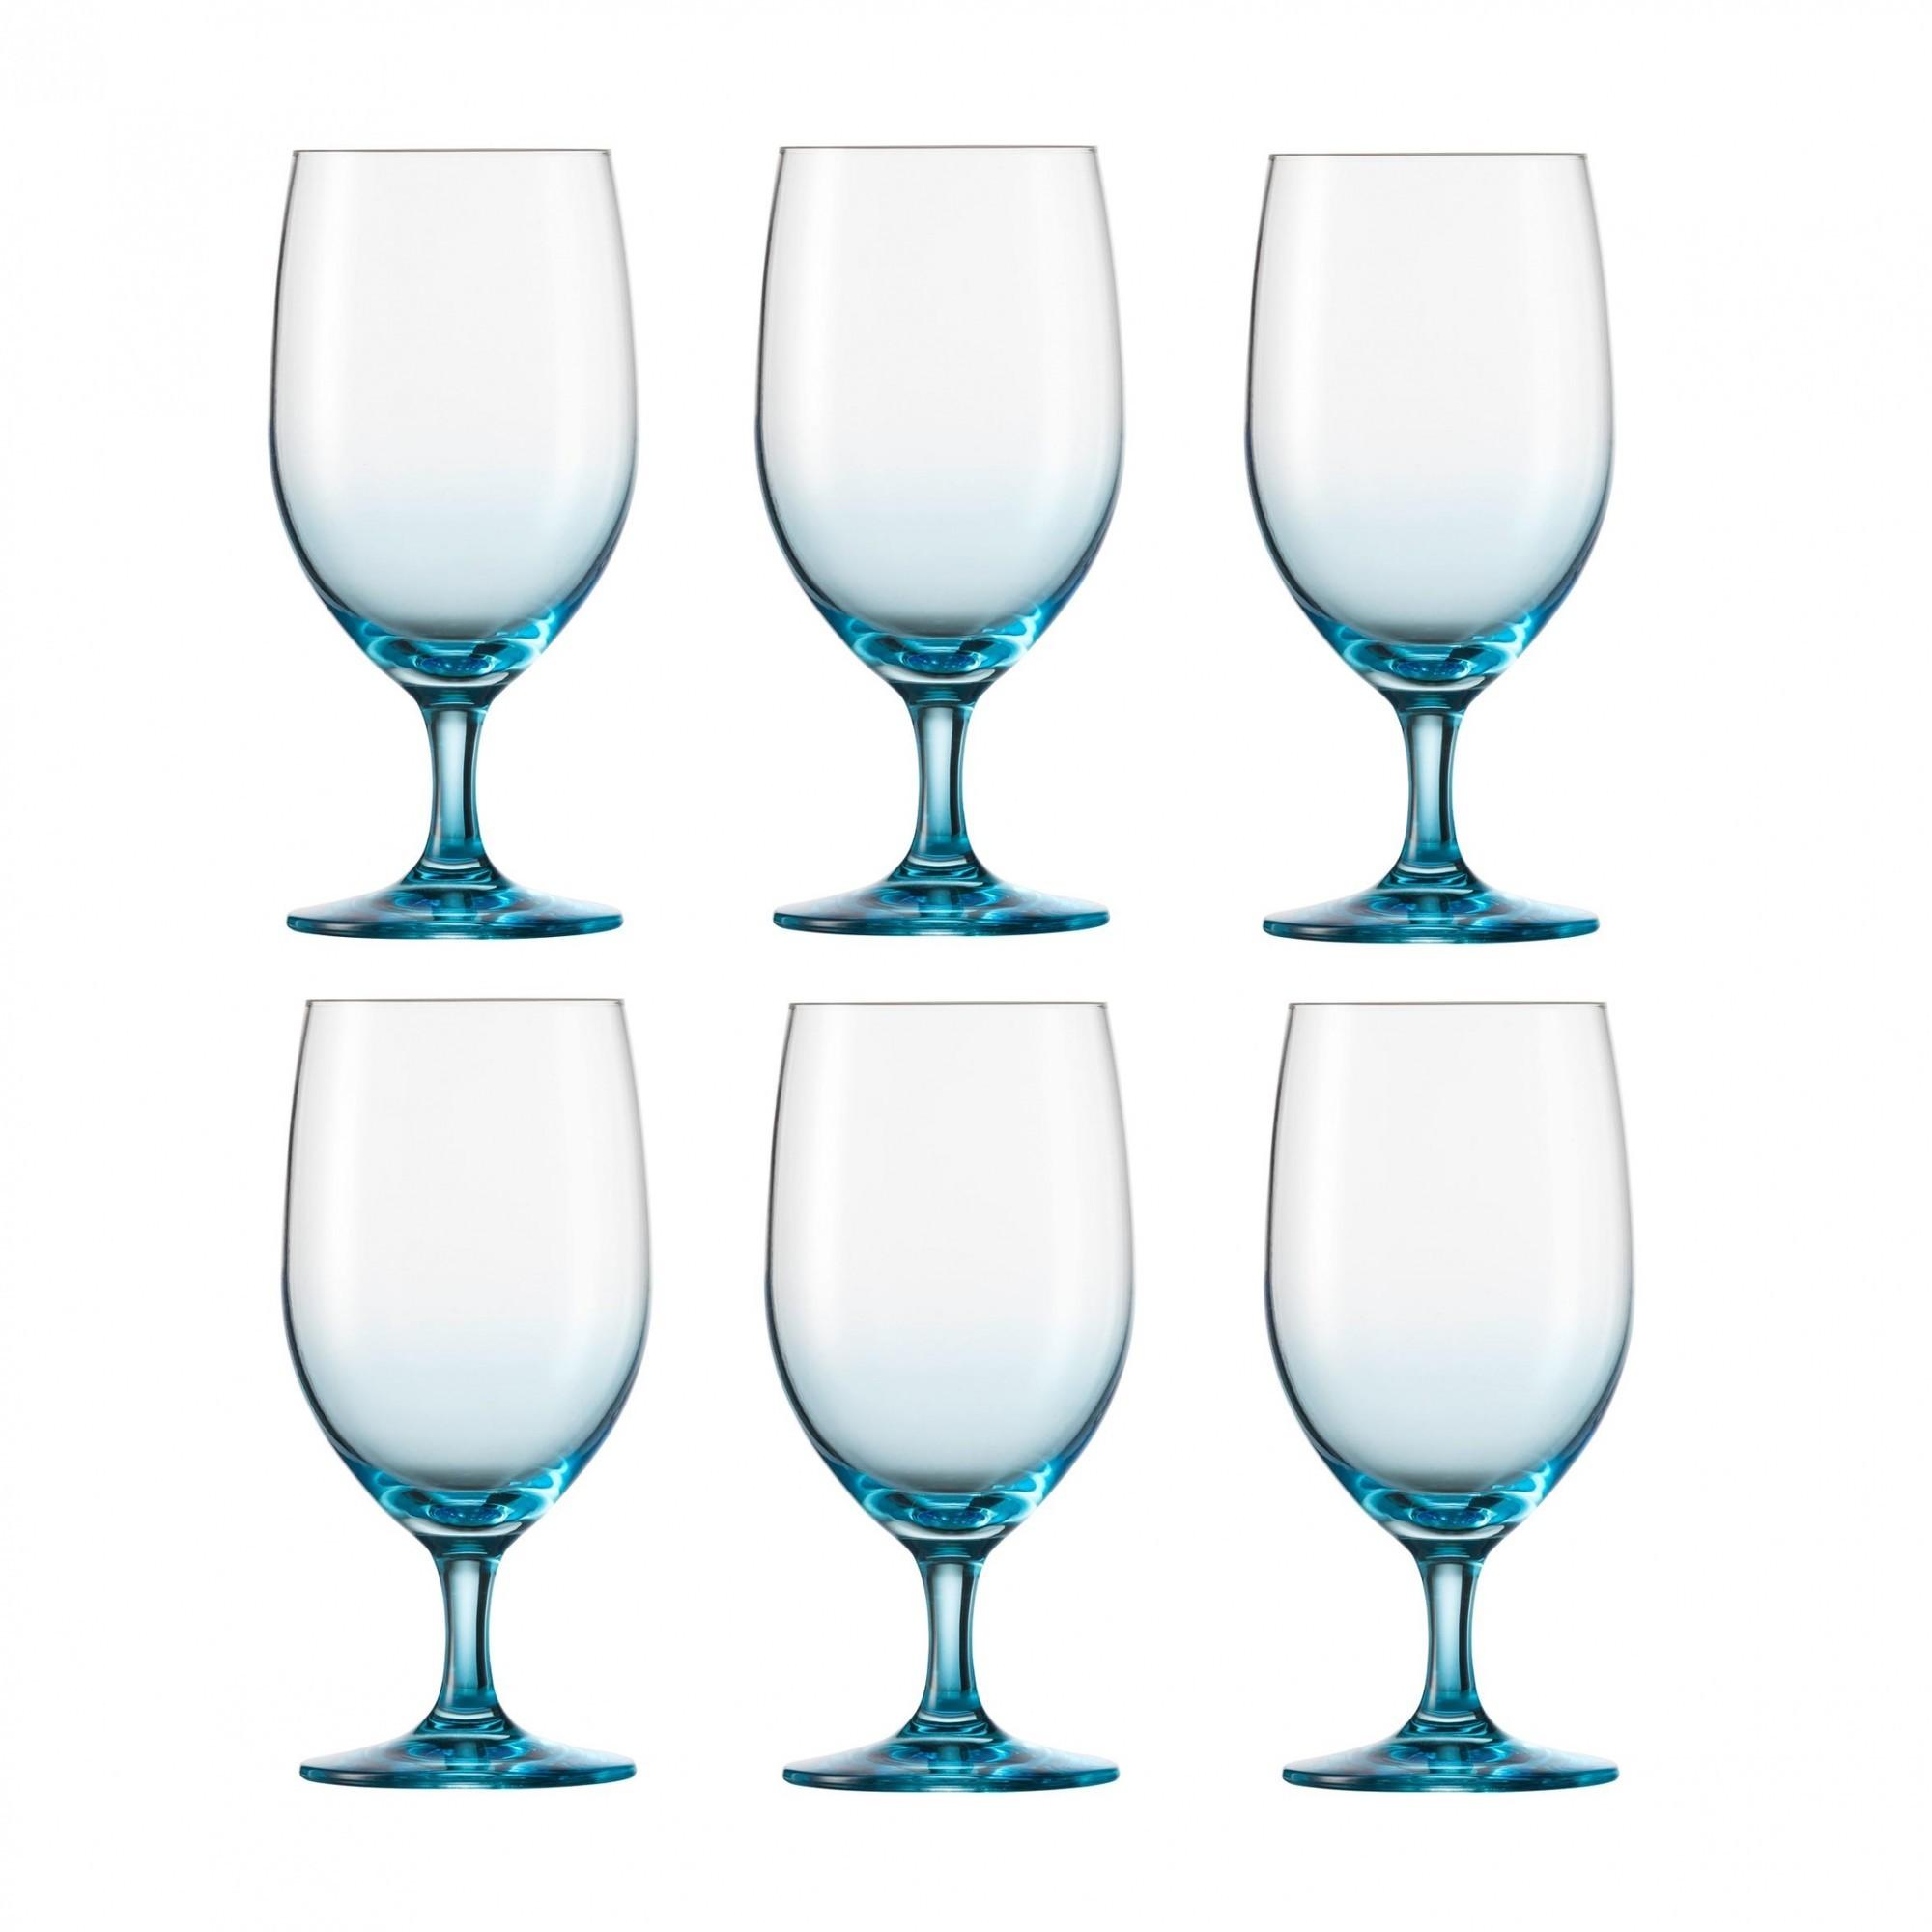 schott zwiesel vina touch water glass set of 6 ambientedirect. Black Bedroom Furniture Sets. Home Design Ideas